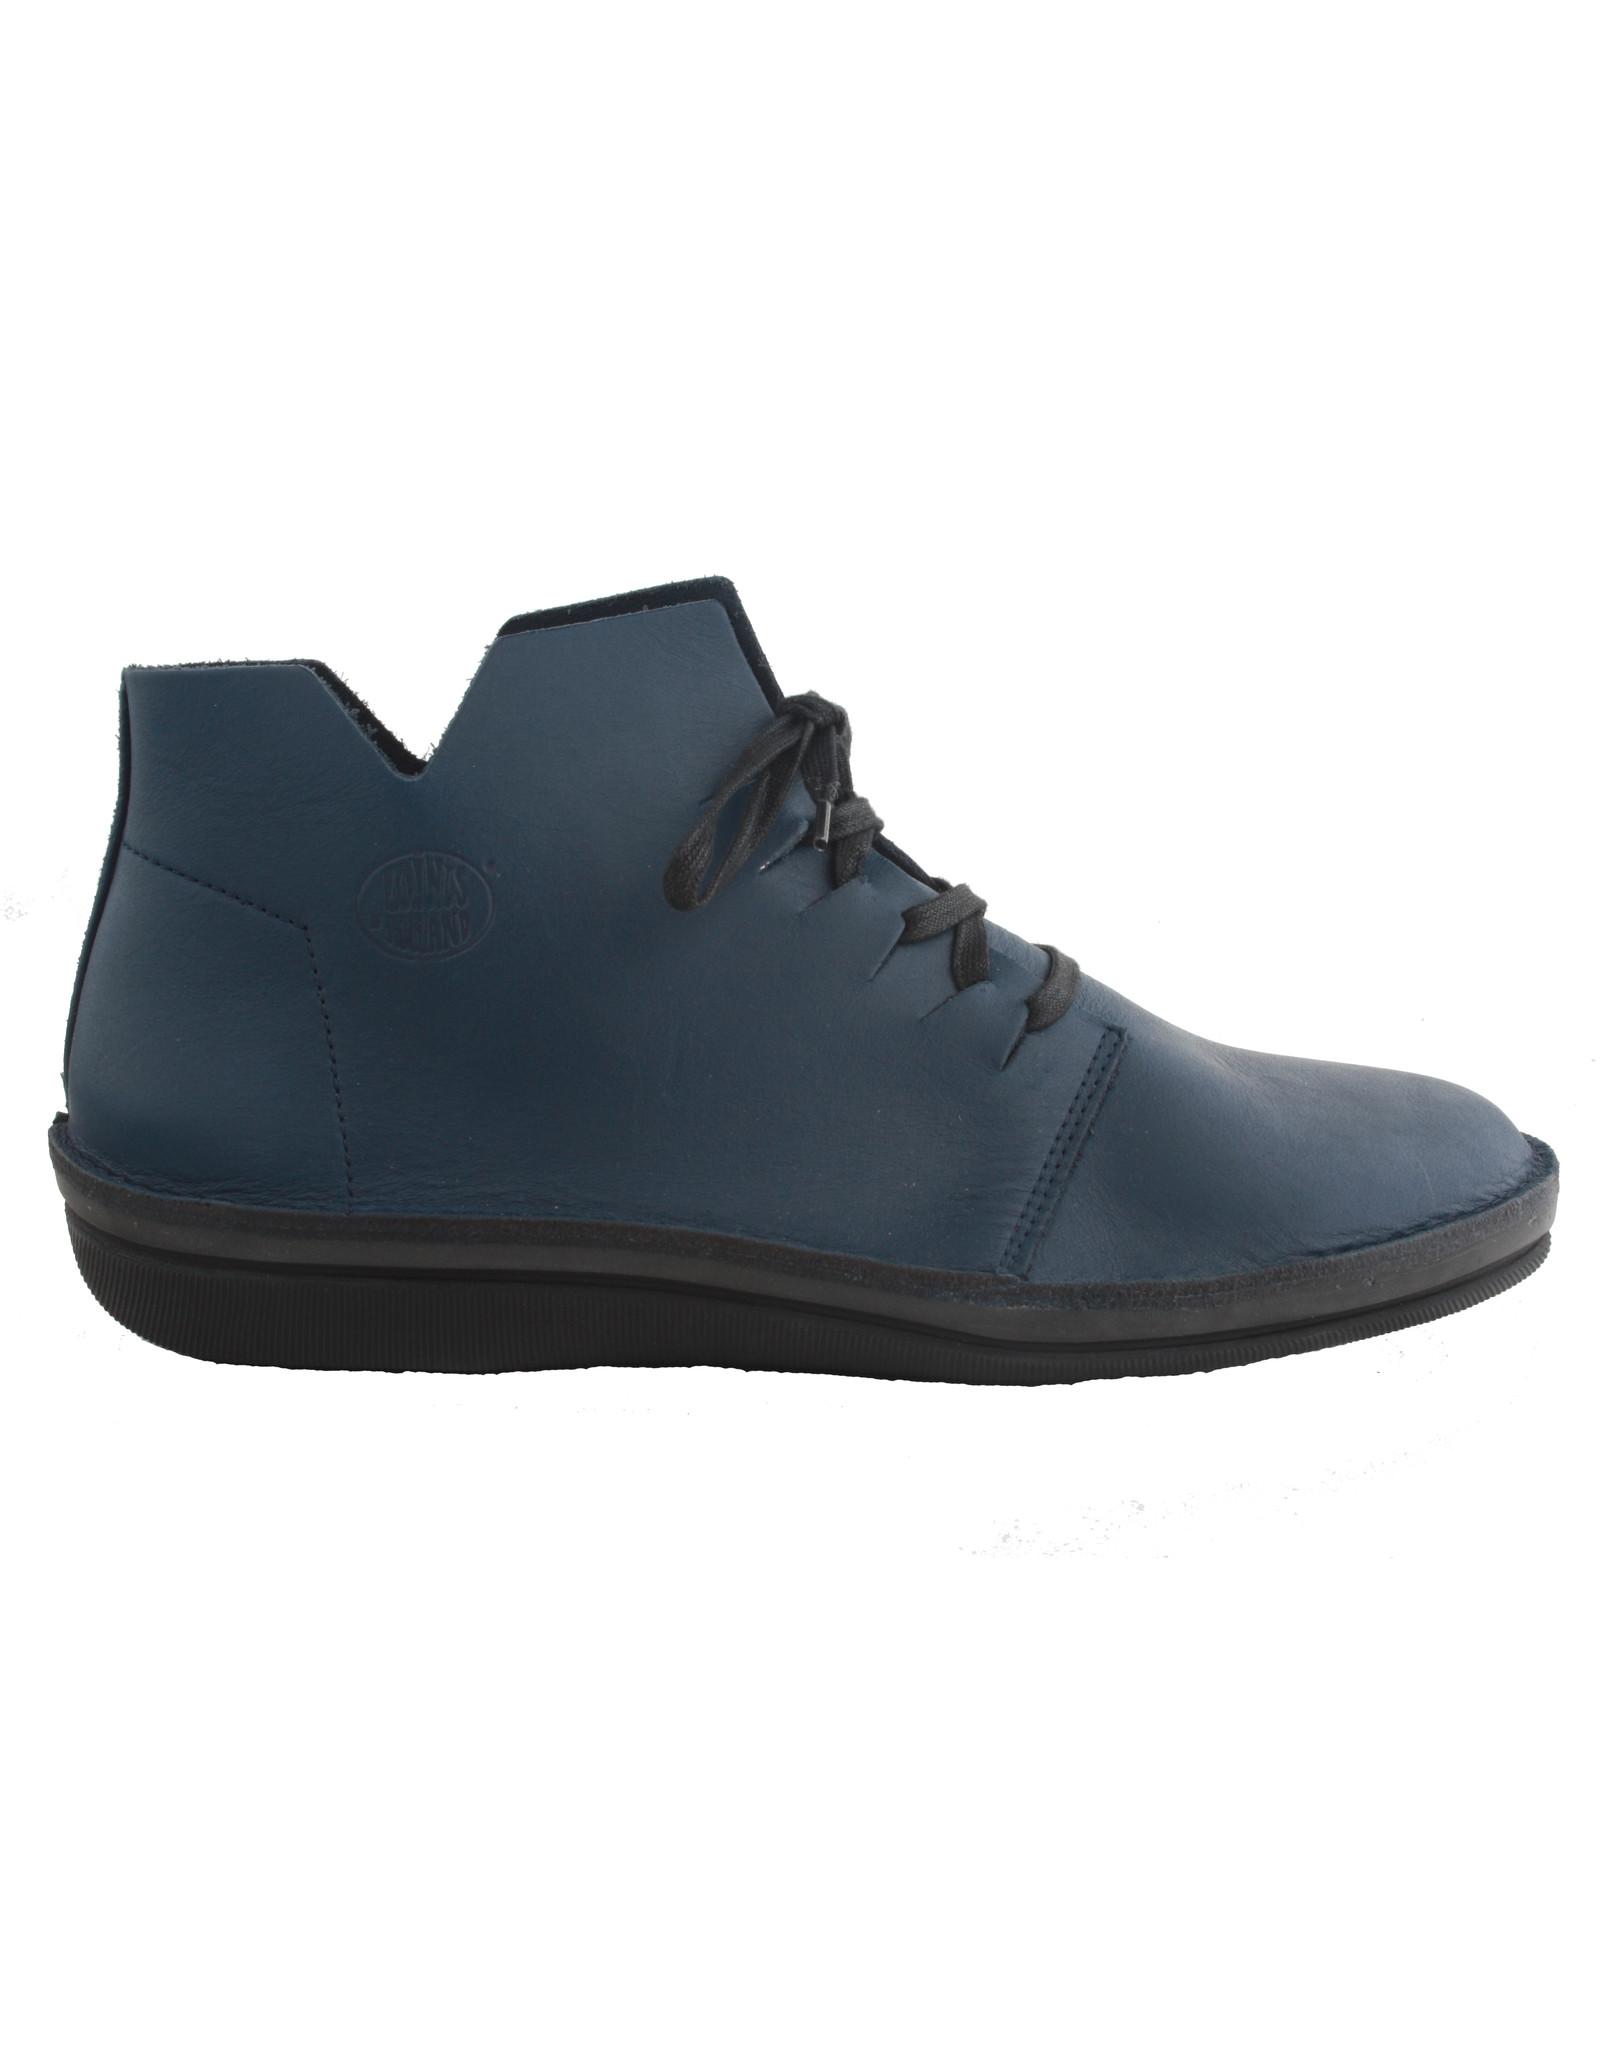 Loints Turbo 49611 161 Blue